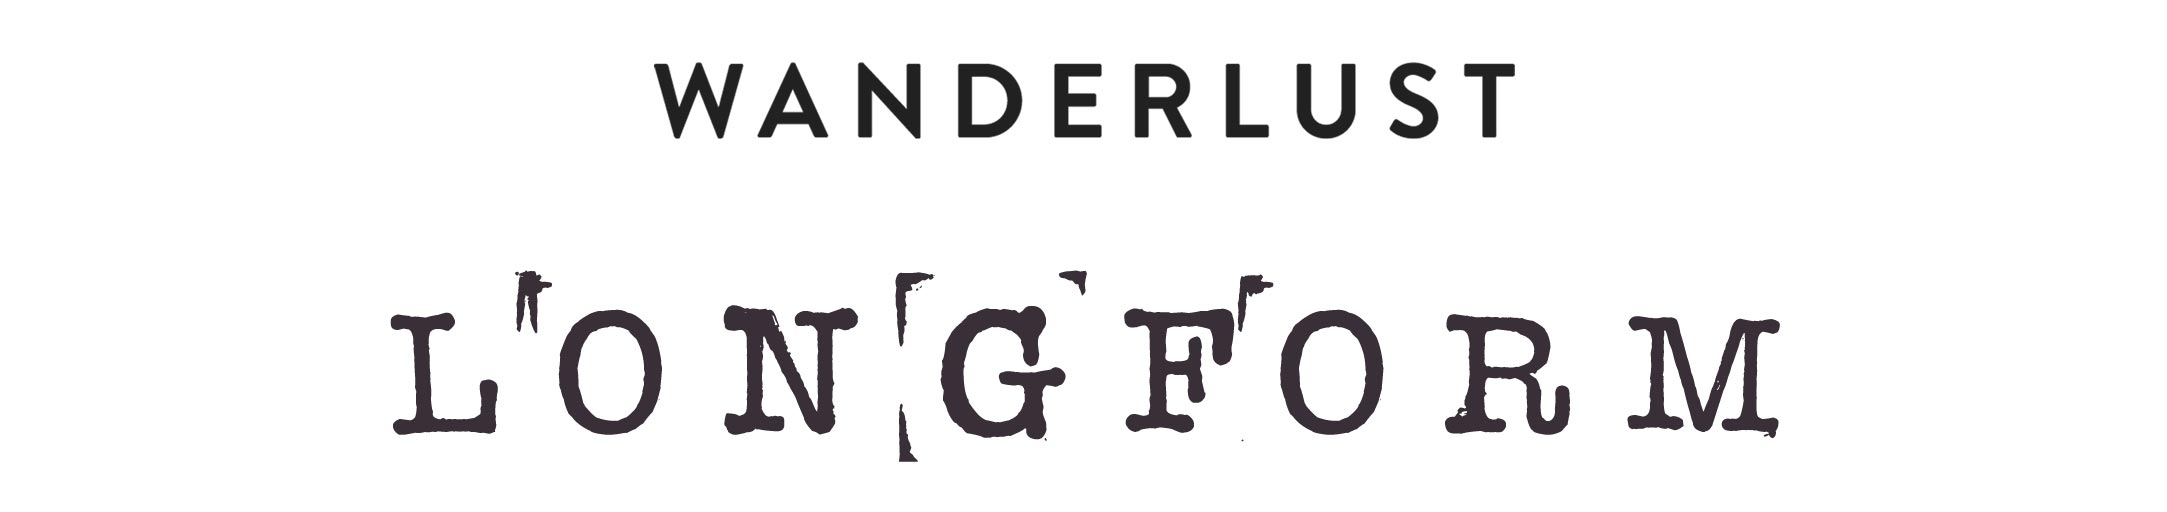 wanderlust-longform-logo